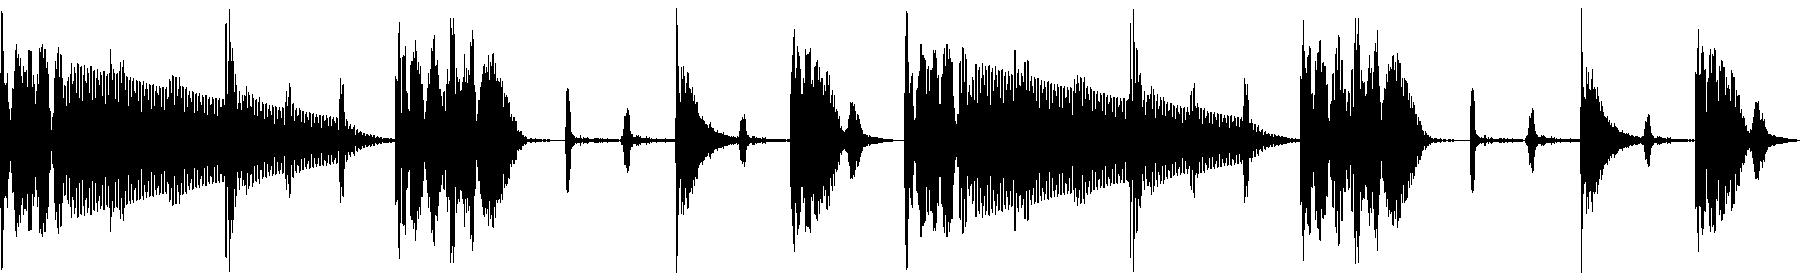 blbc cruisindrums 75 03